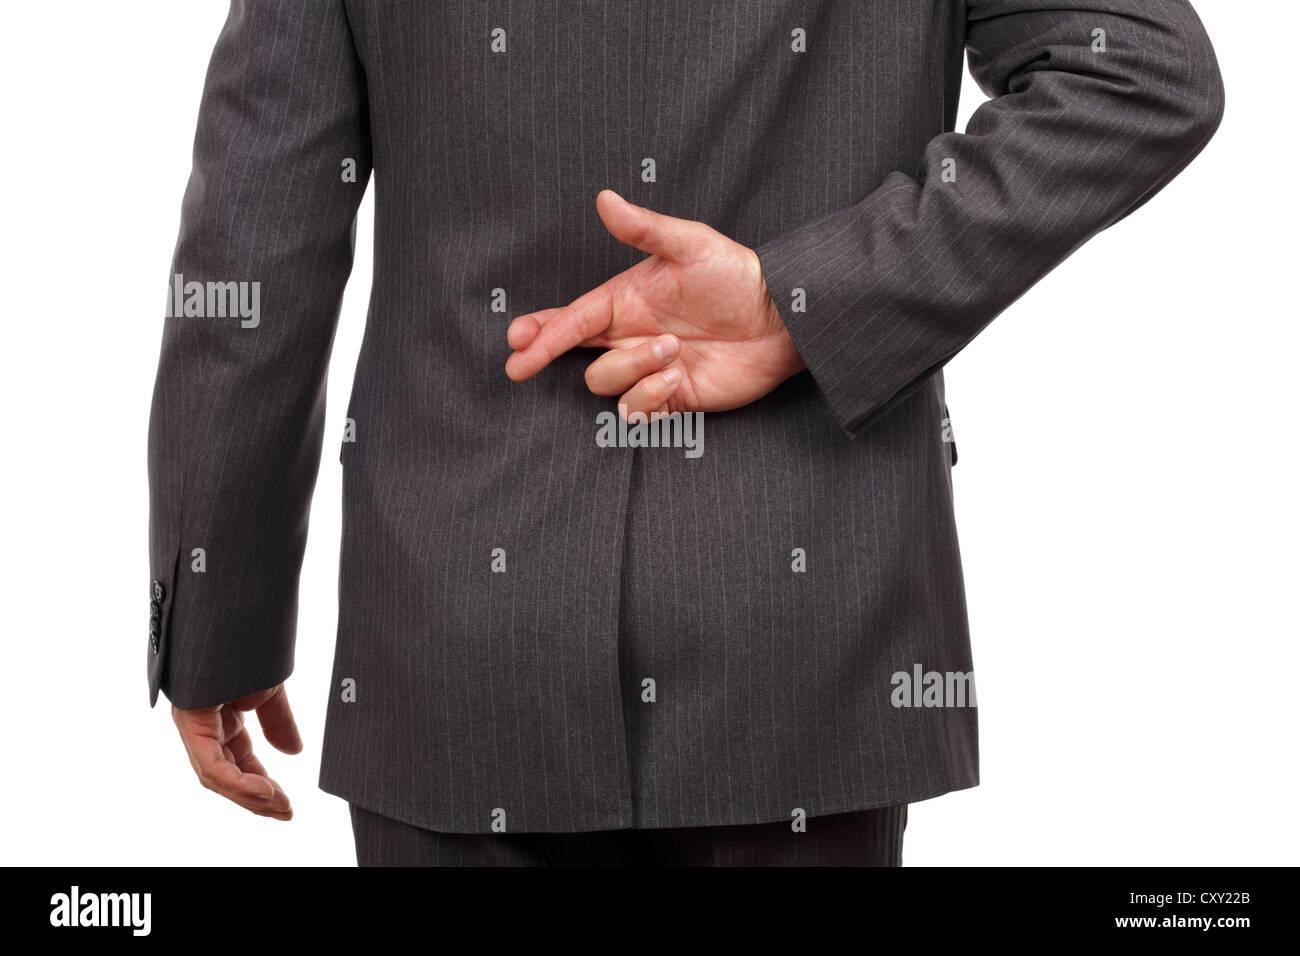 Fingers crossed behind businessmans back - Stock Image